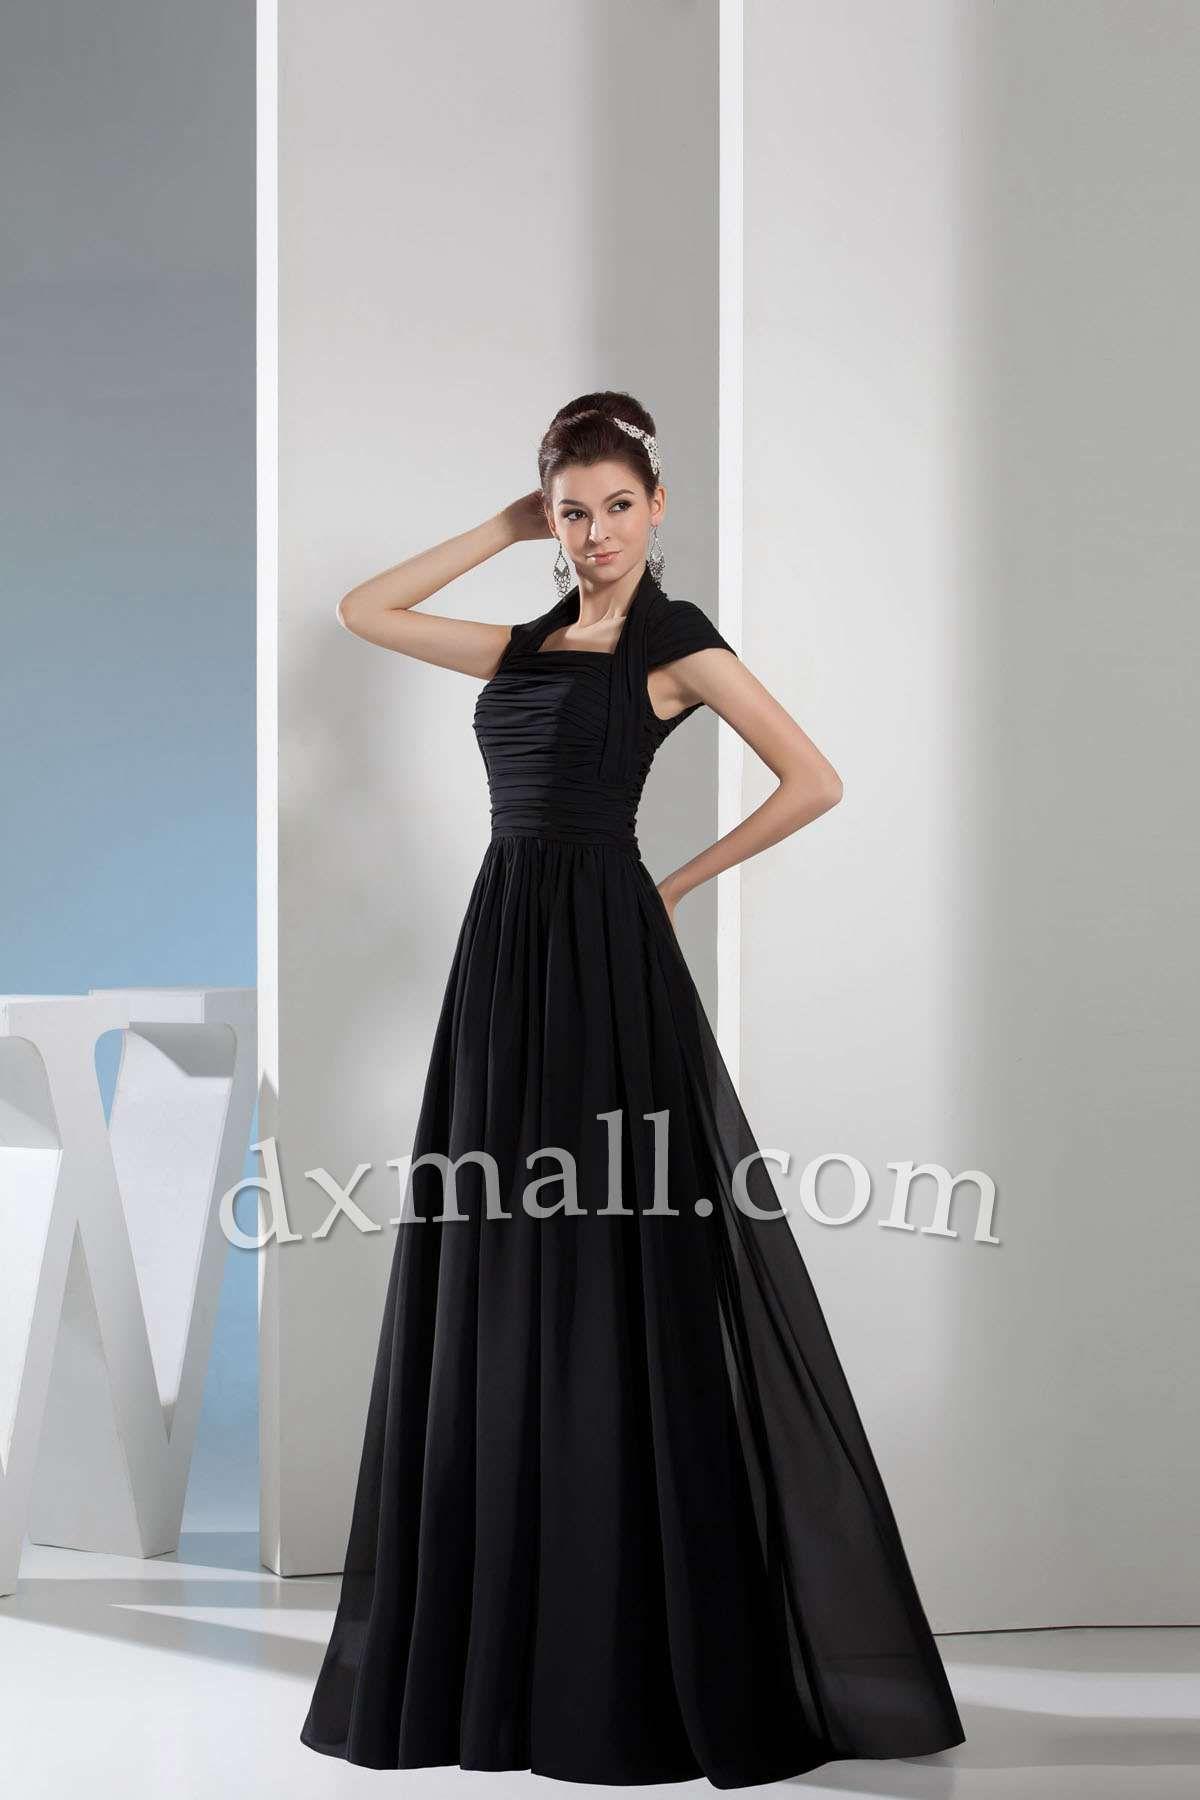 SheathColumn Wedding Guest Dresses High Neck Floor Length Chiffon